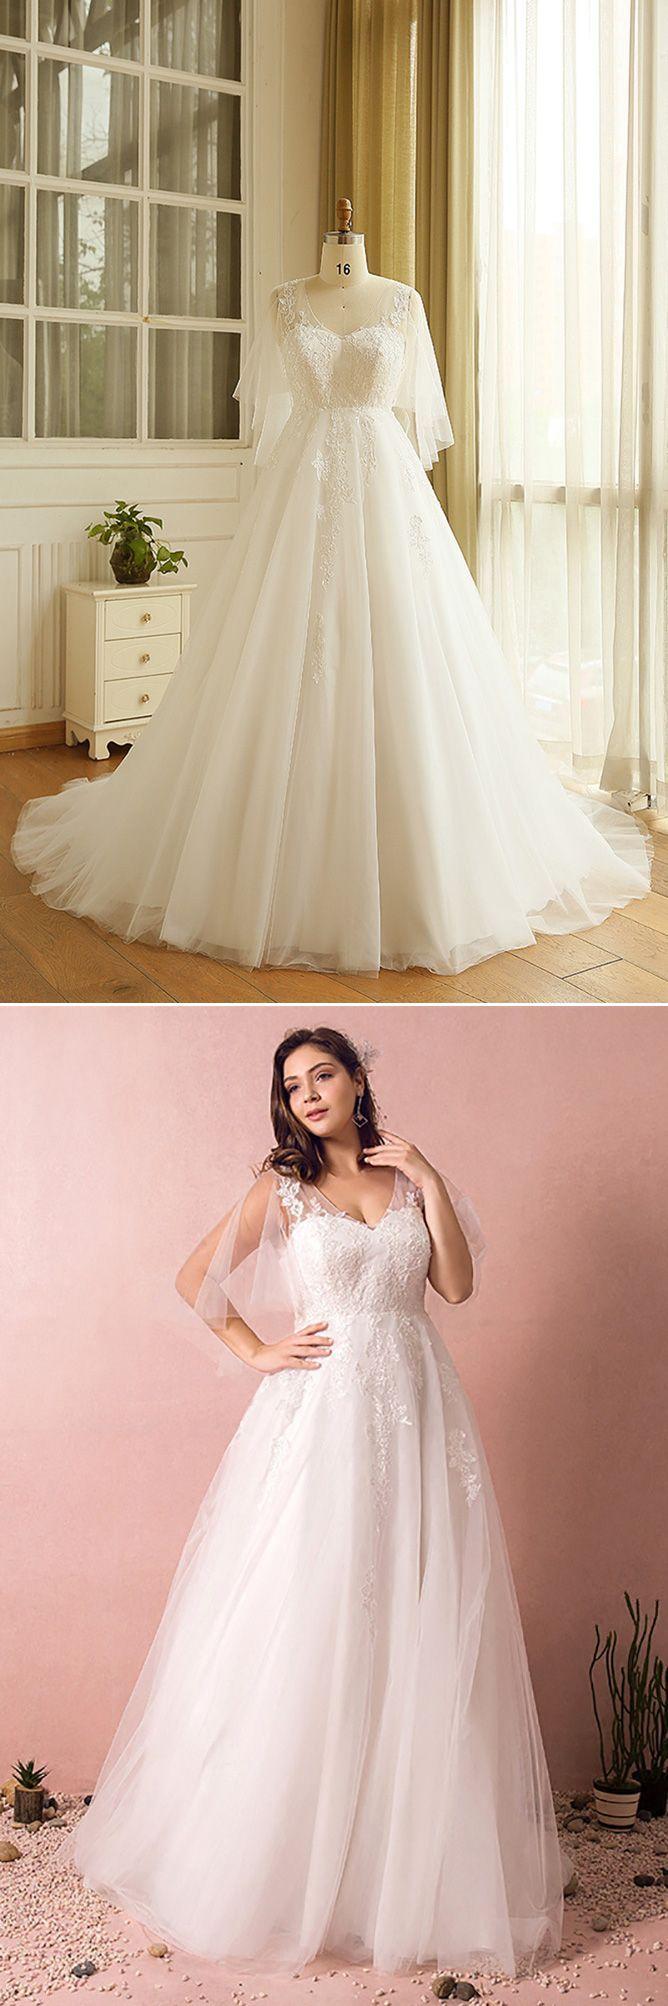 Plus size tulle beach wedding dress boho with sleeves mn